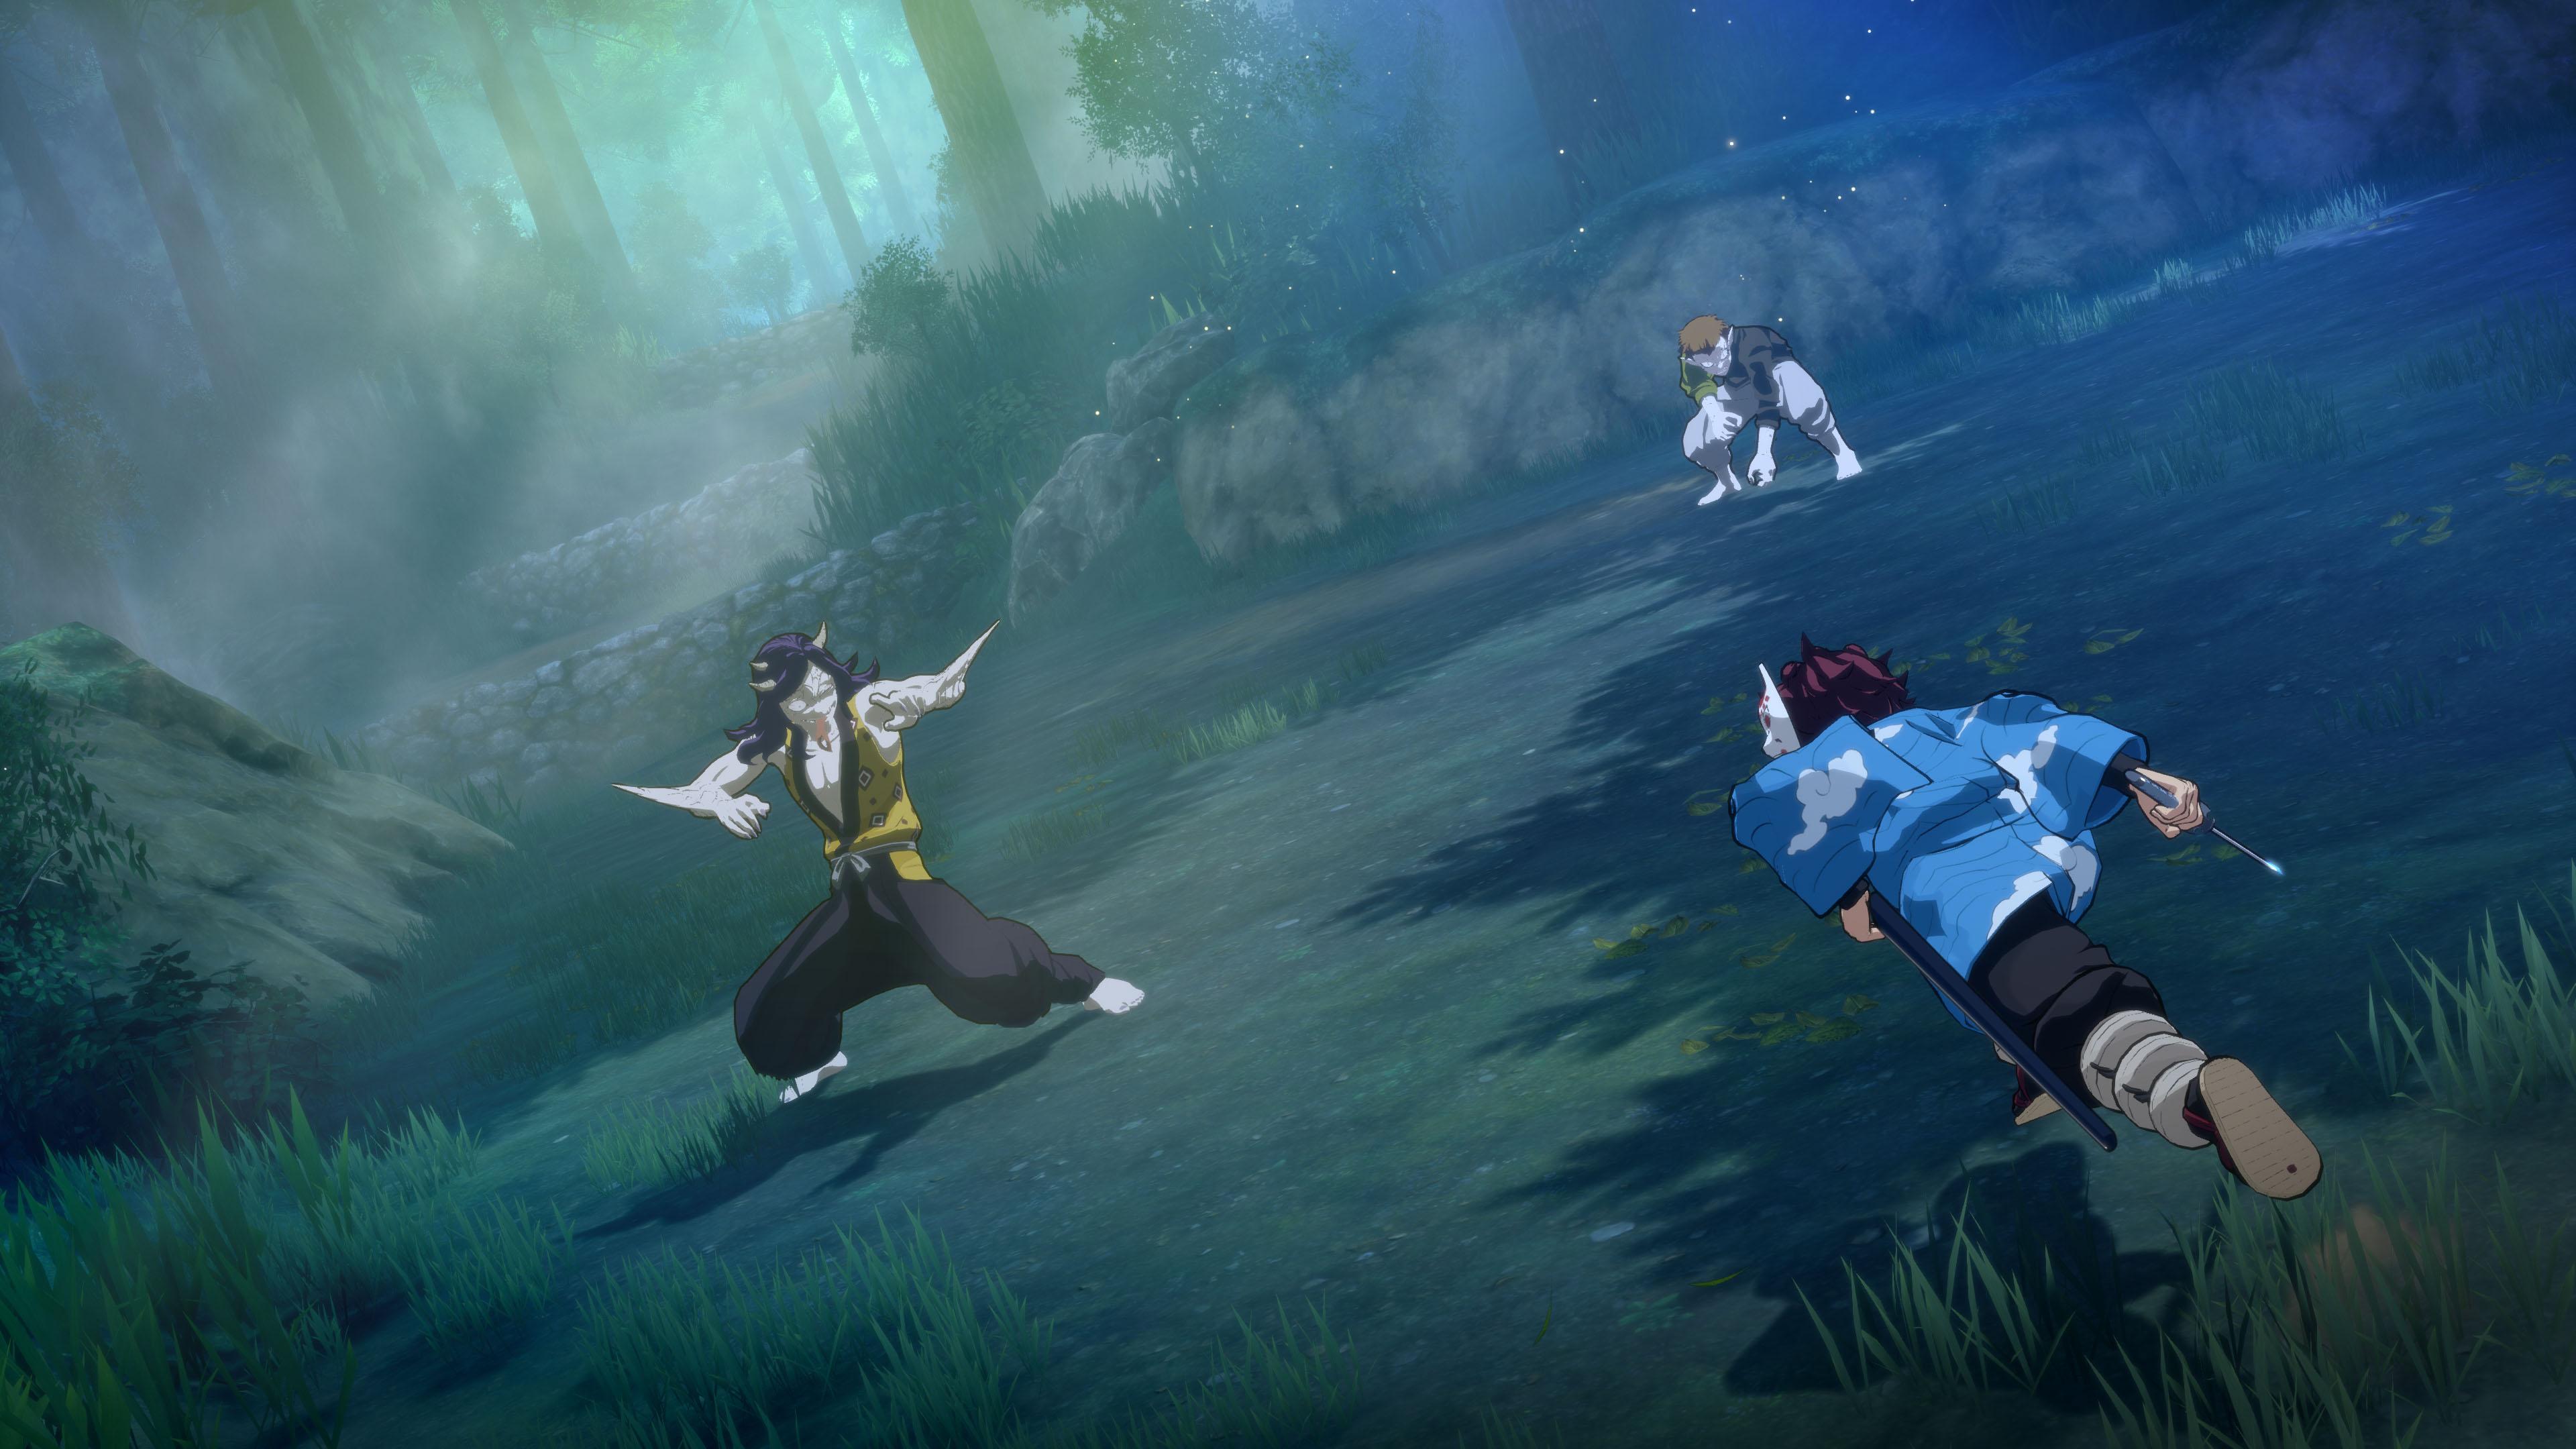 Скриншот №2 к Demon Slayer -Kimetsu no Yaiba- The Hinokami Chronicles Deluxe Edition PS4 and PS5